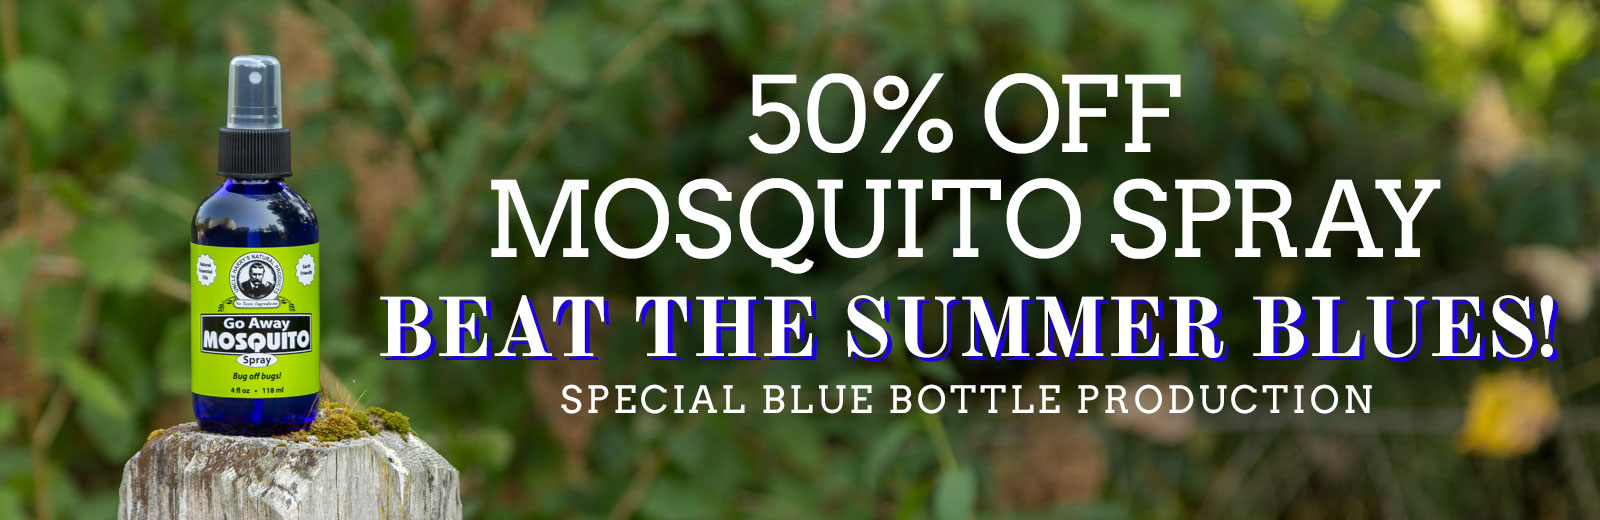 Go Away Mosquito Spray - 50% Off